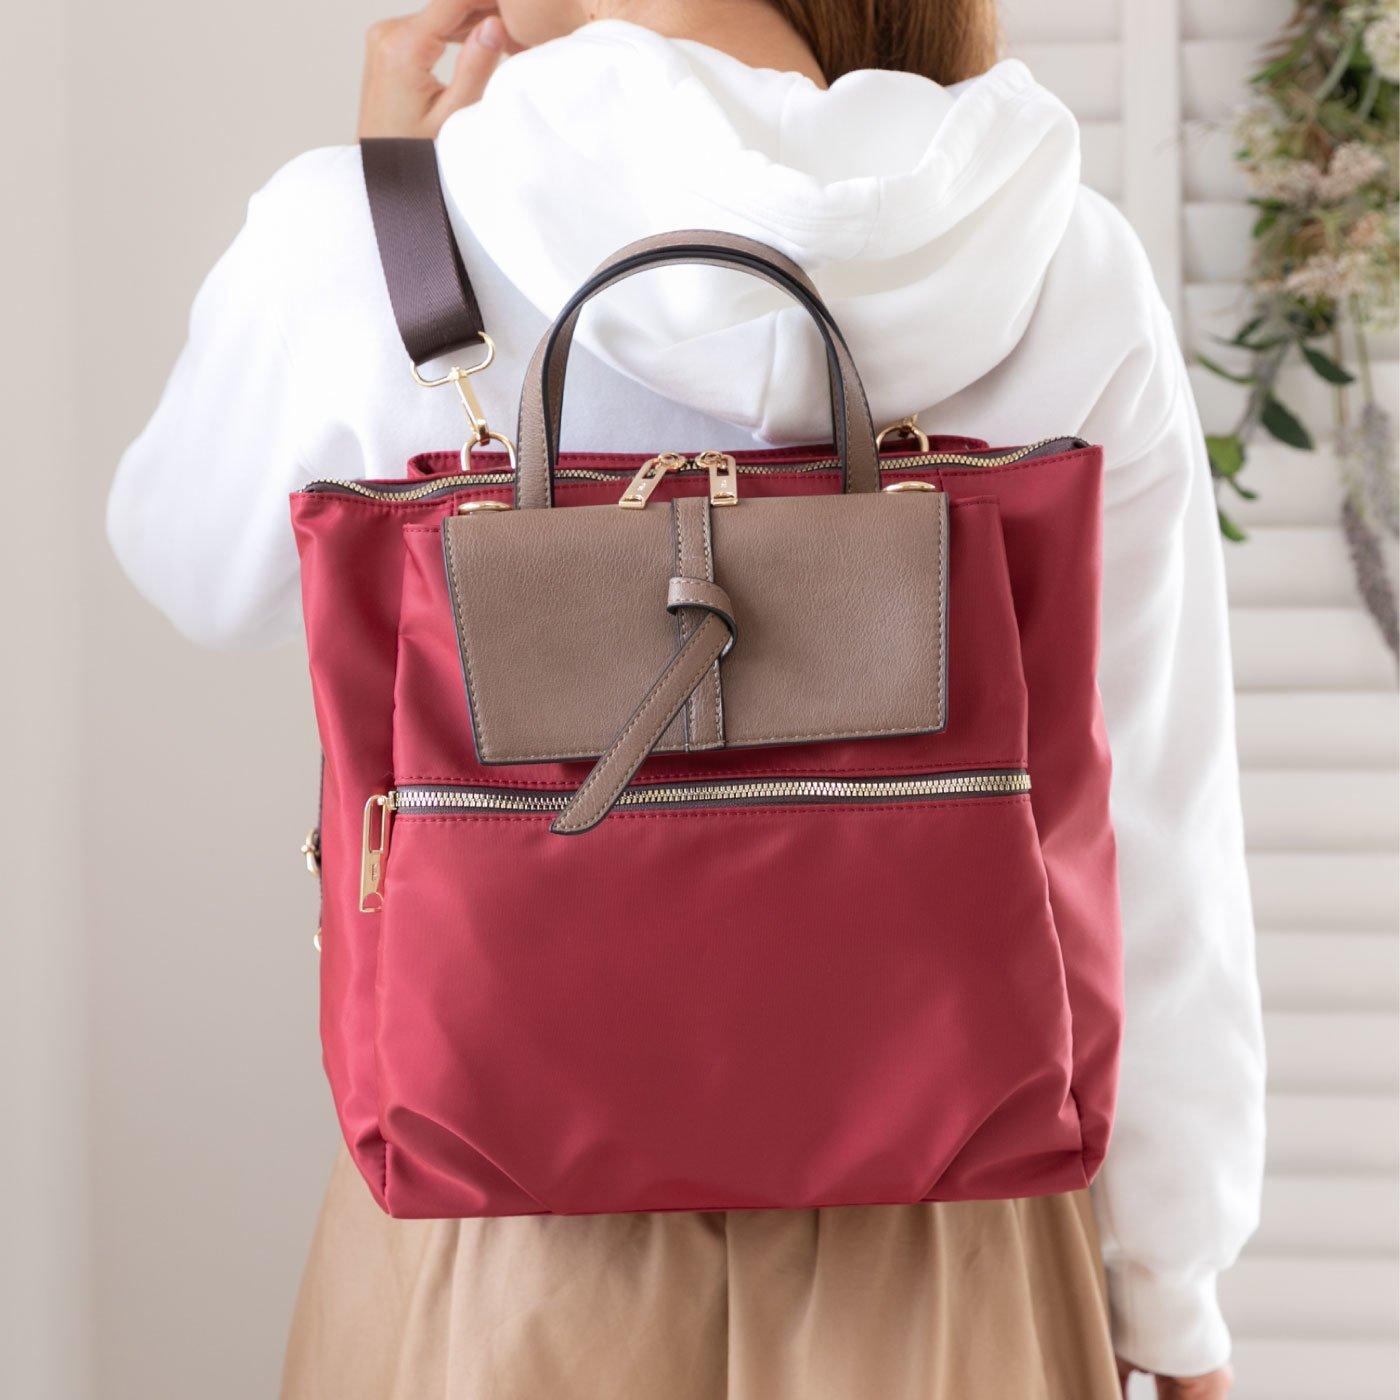 QUAY(キー) リュックと斜めがけの2WAY使いできるはっ水ナイロン×合成皮革バッグ